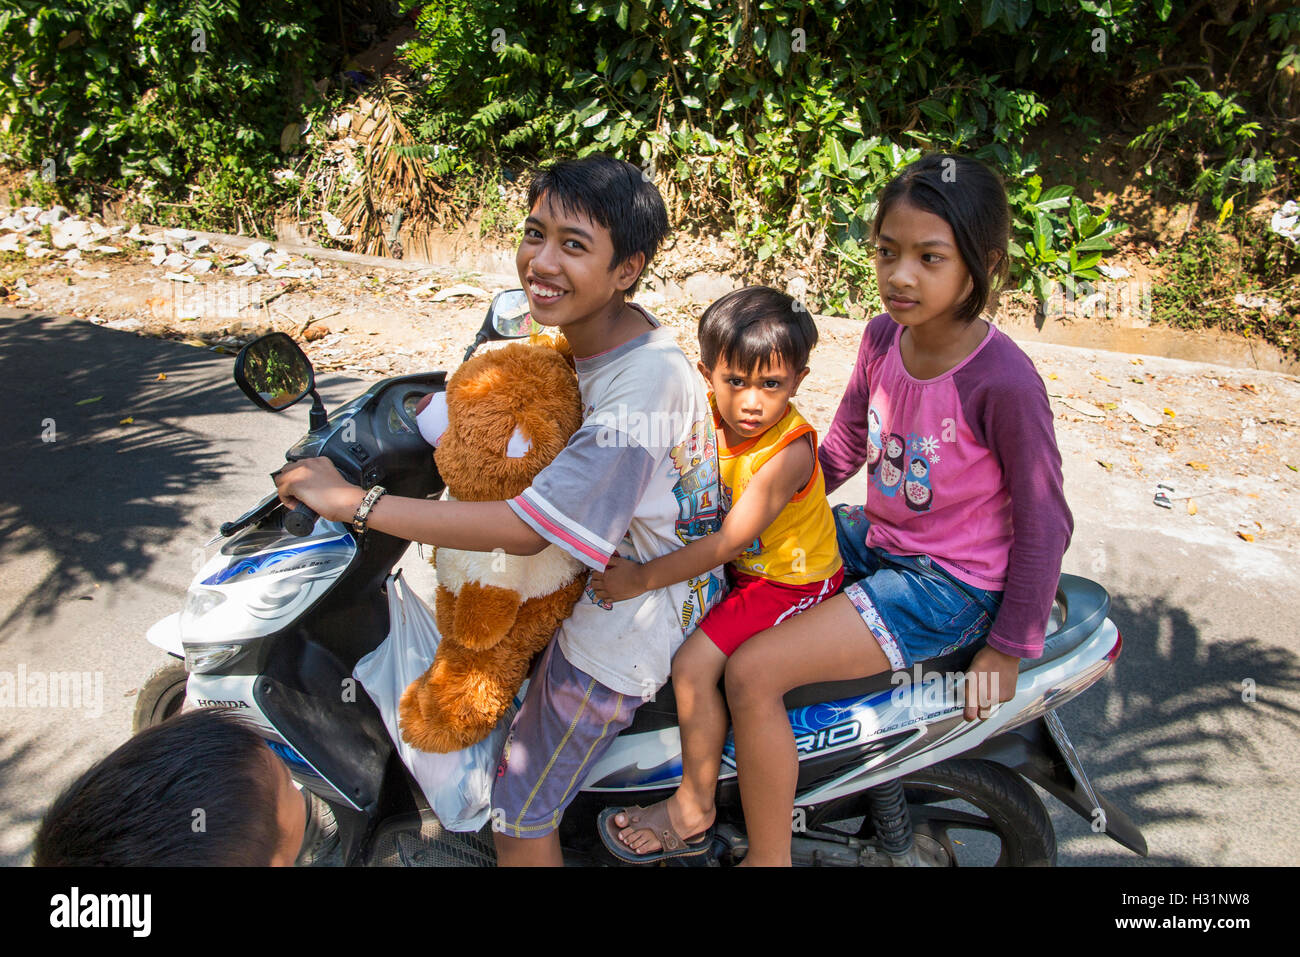 Indonesia, Bali, Lovina, Anturan Village three young children riding on motorbike - Stock Image